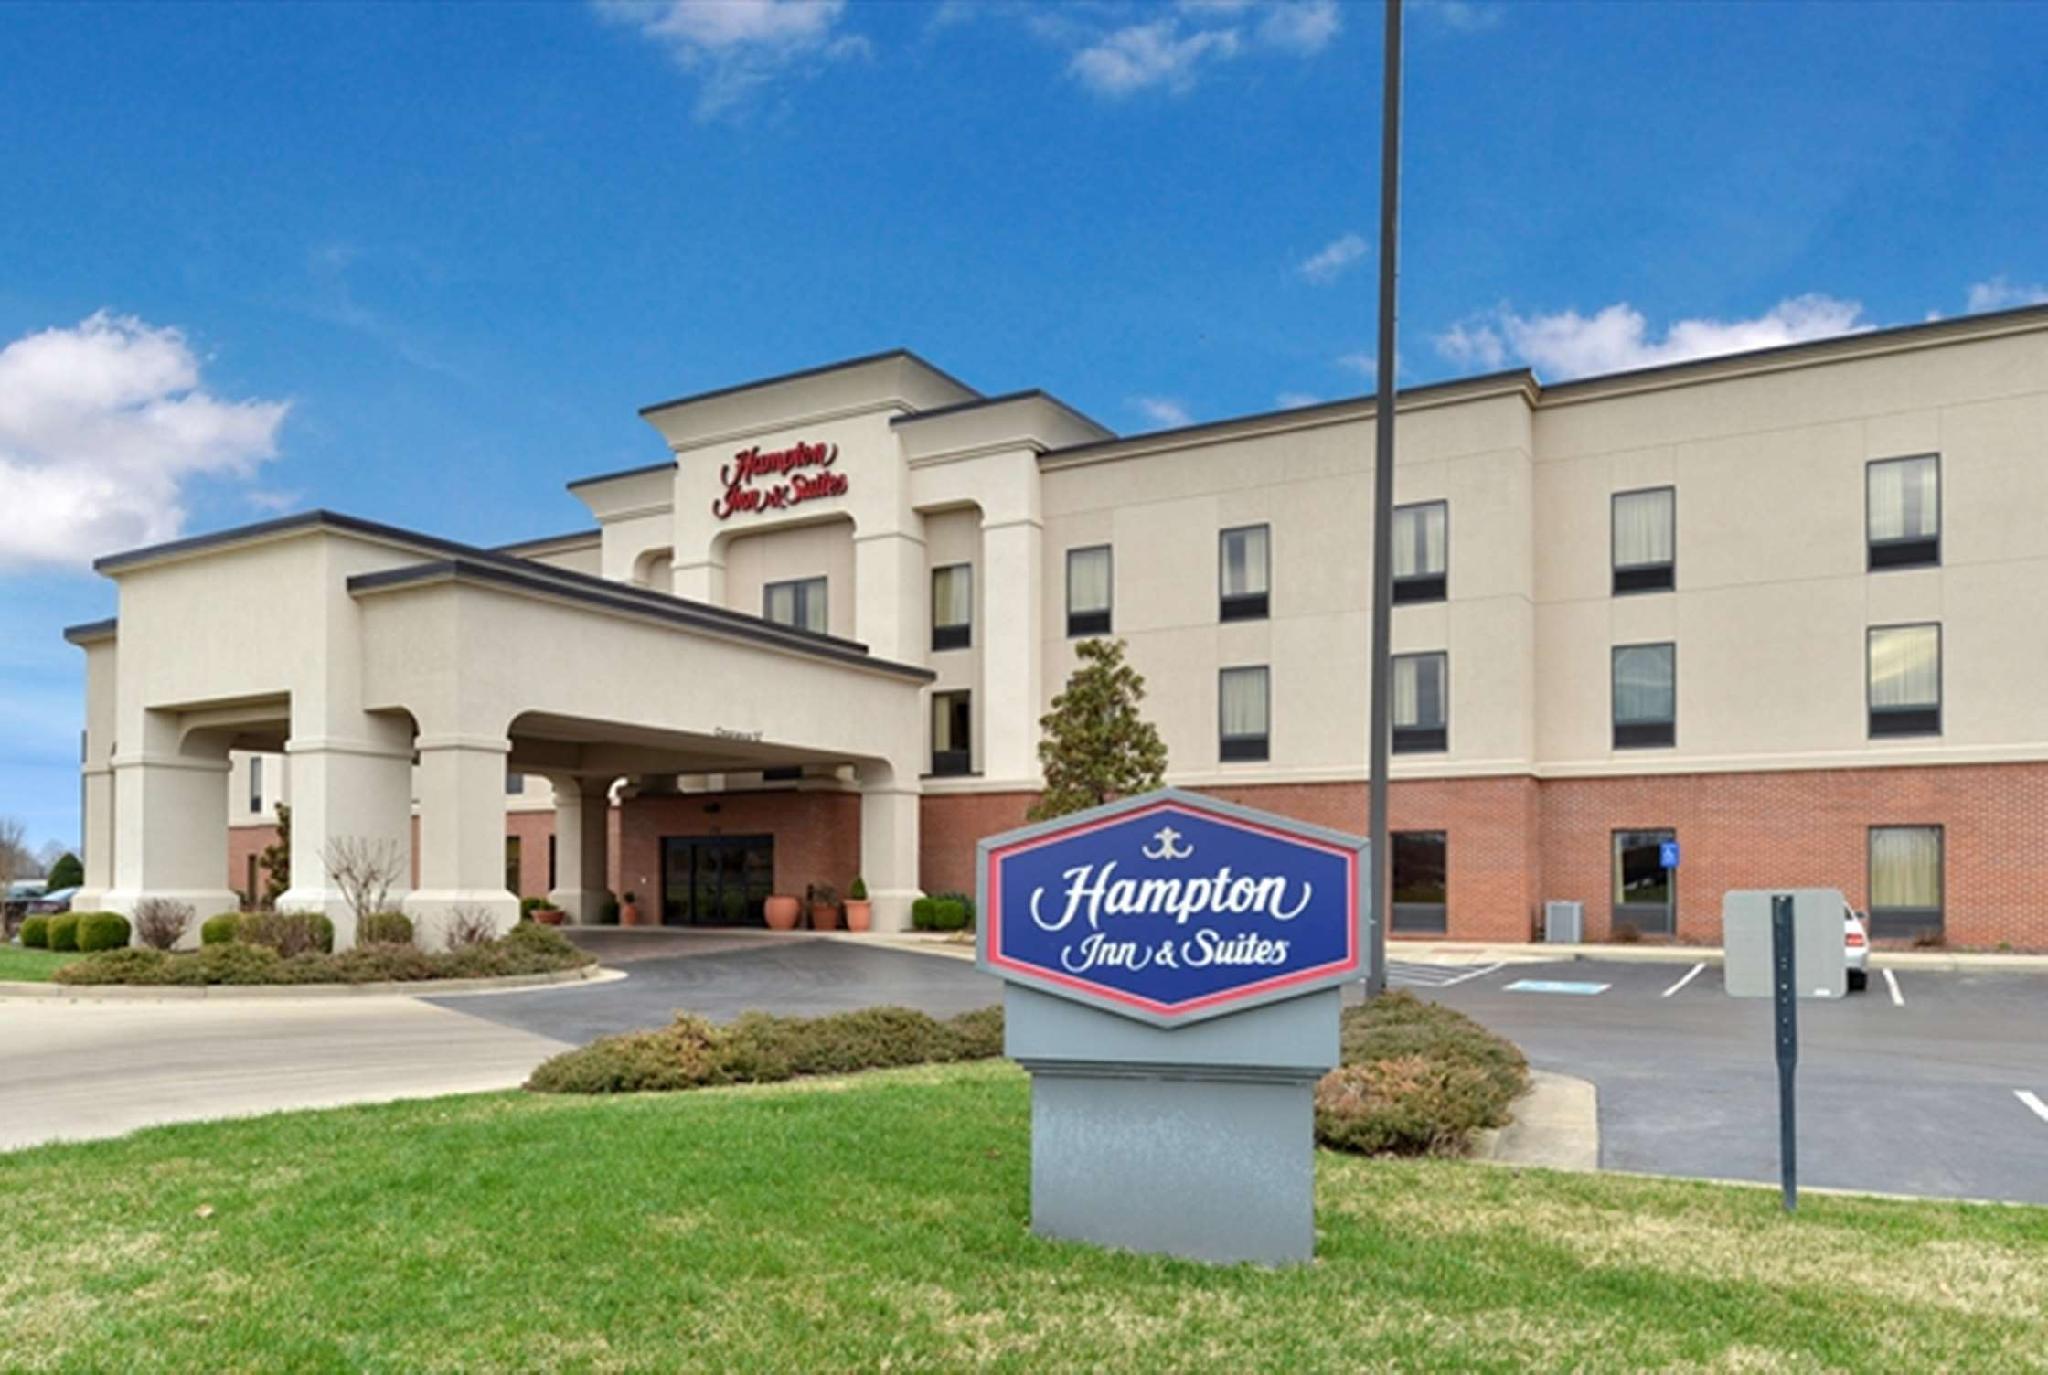 Hampton Inn And Suites Hopkinsville